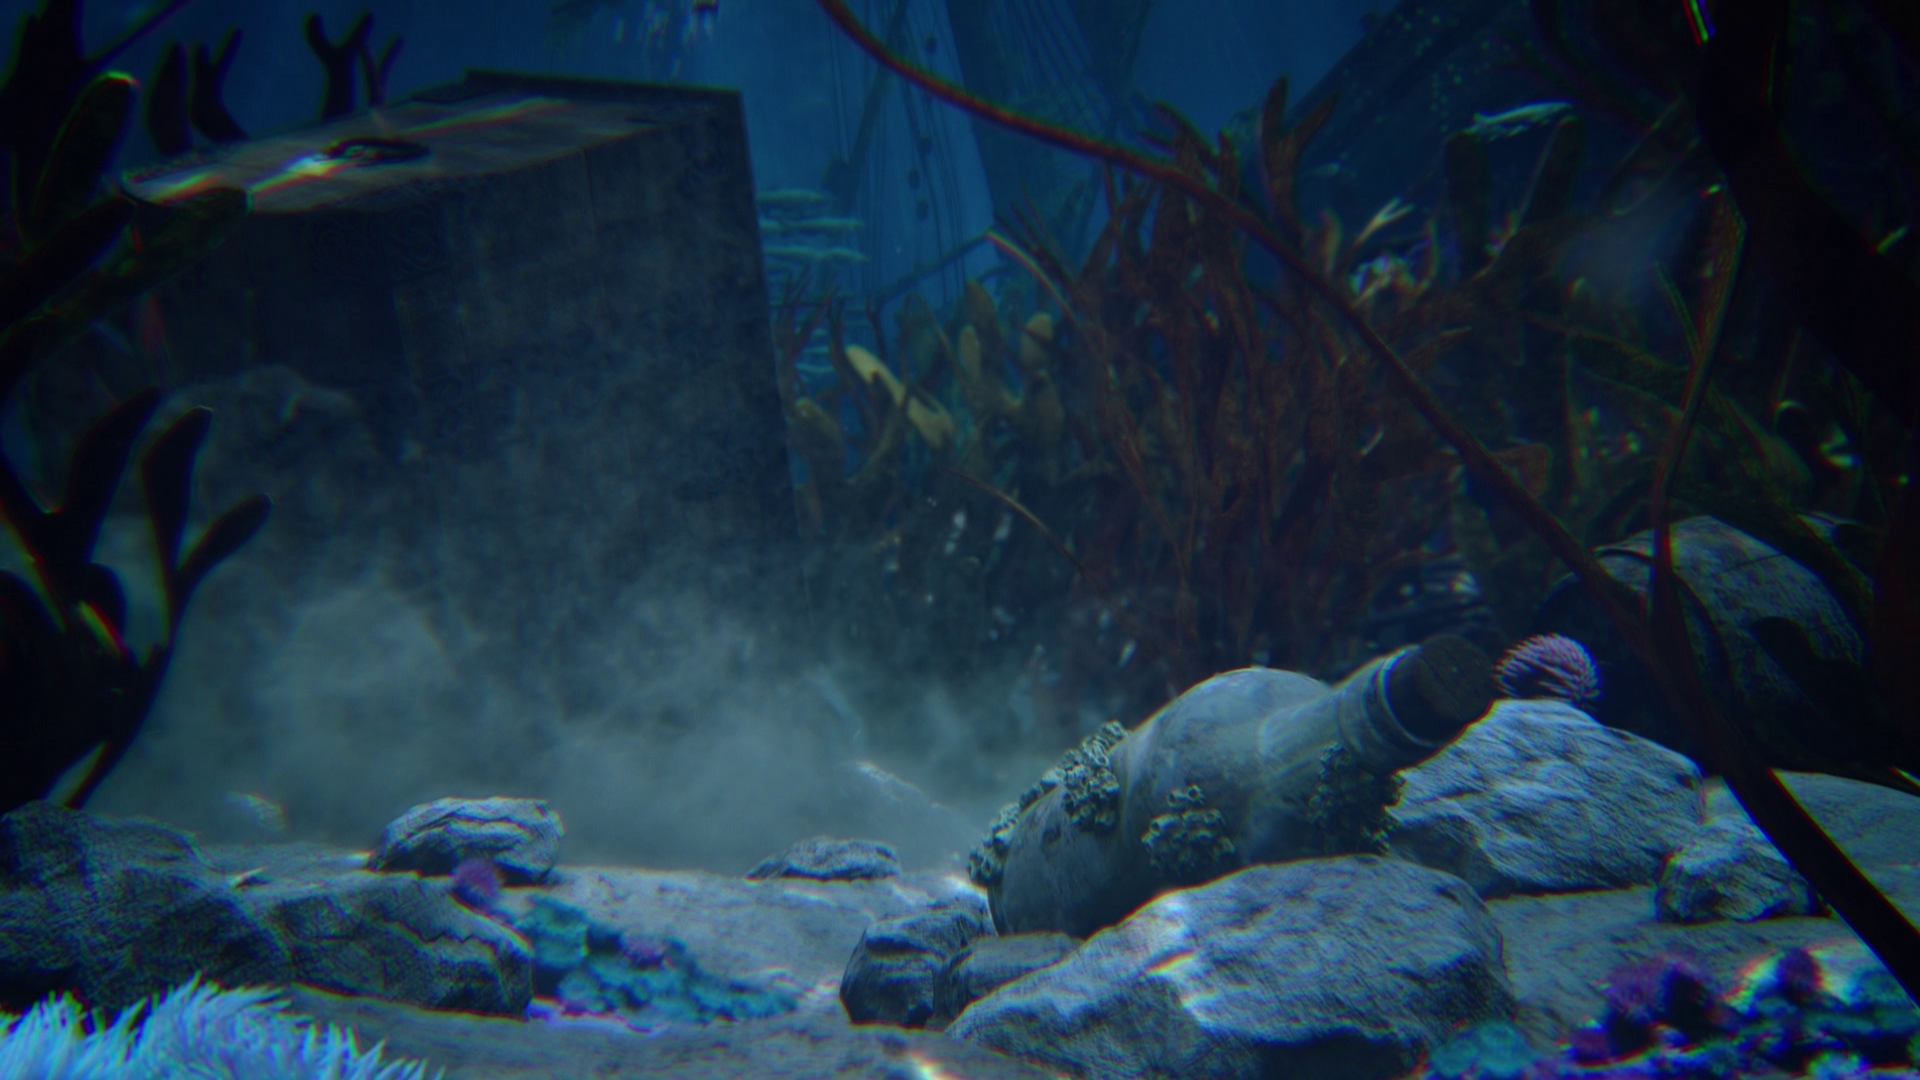 Poseidon's Boneyard